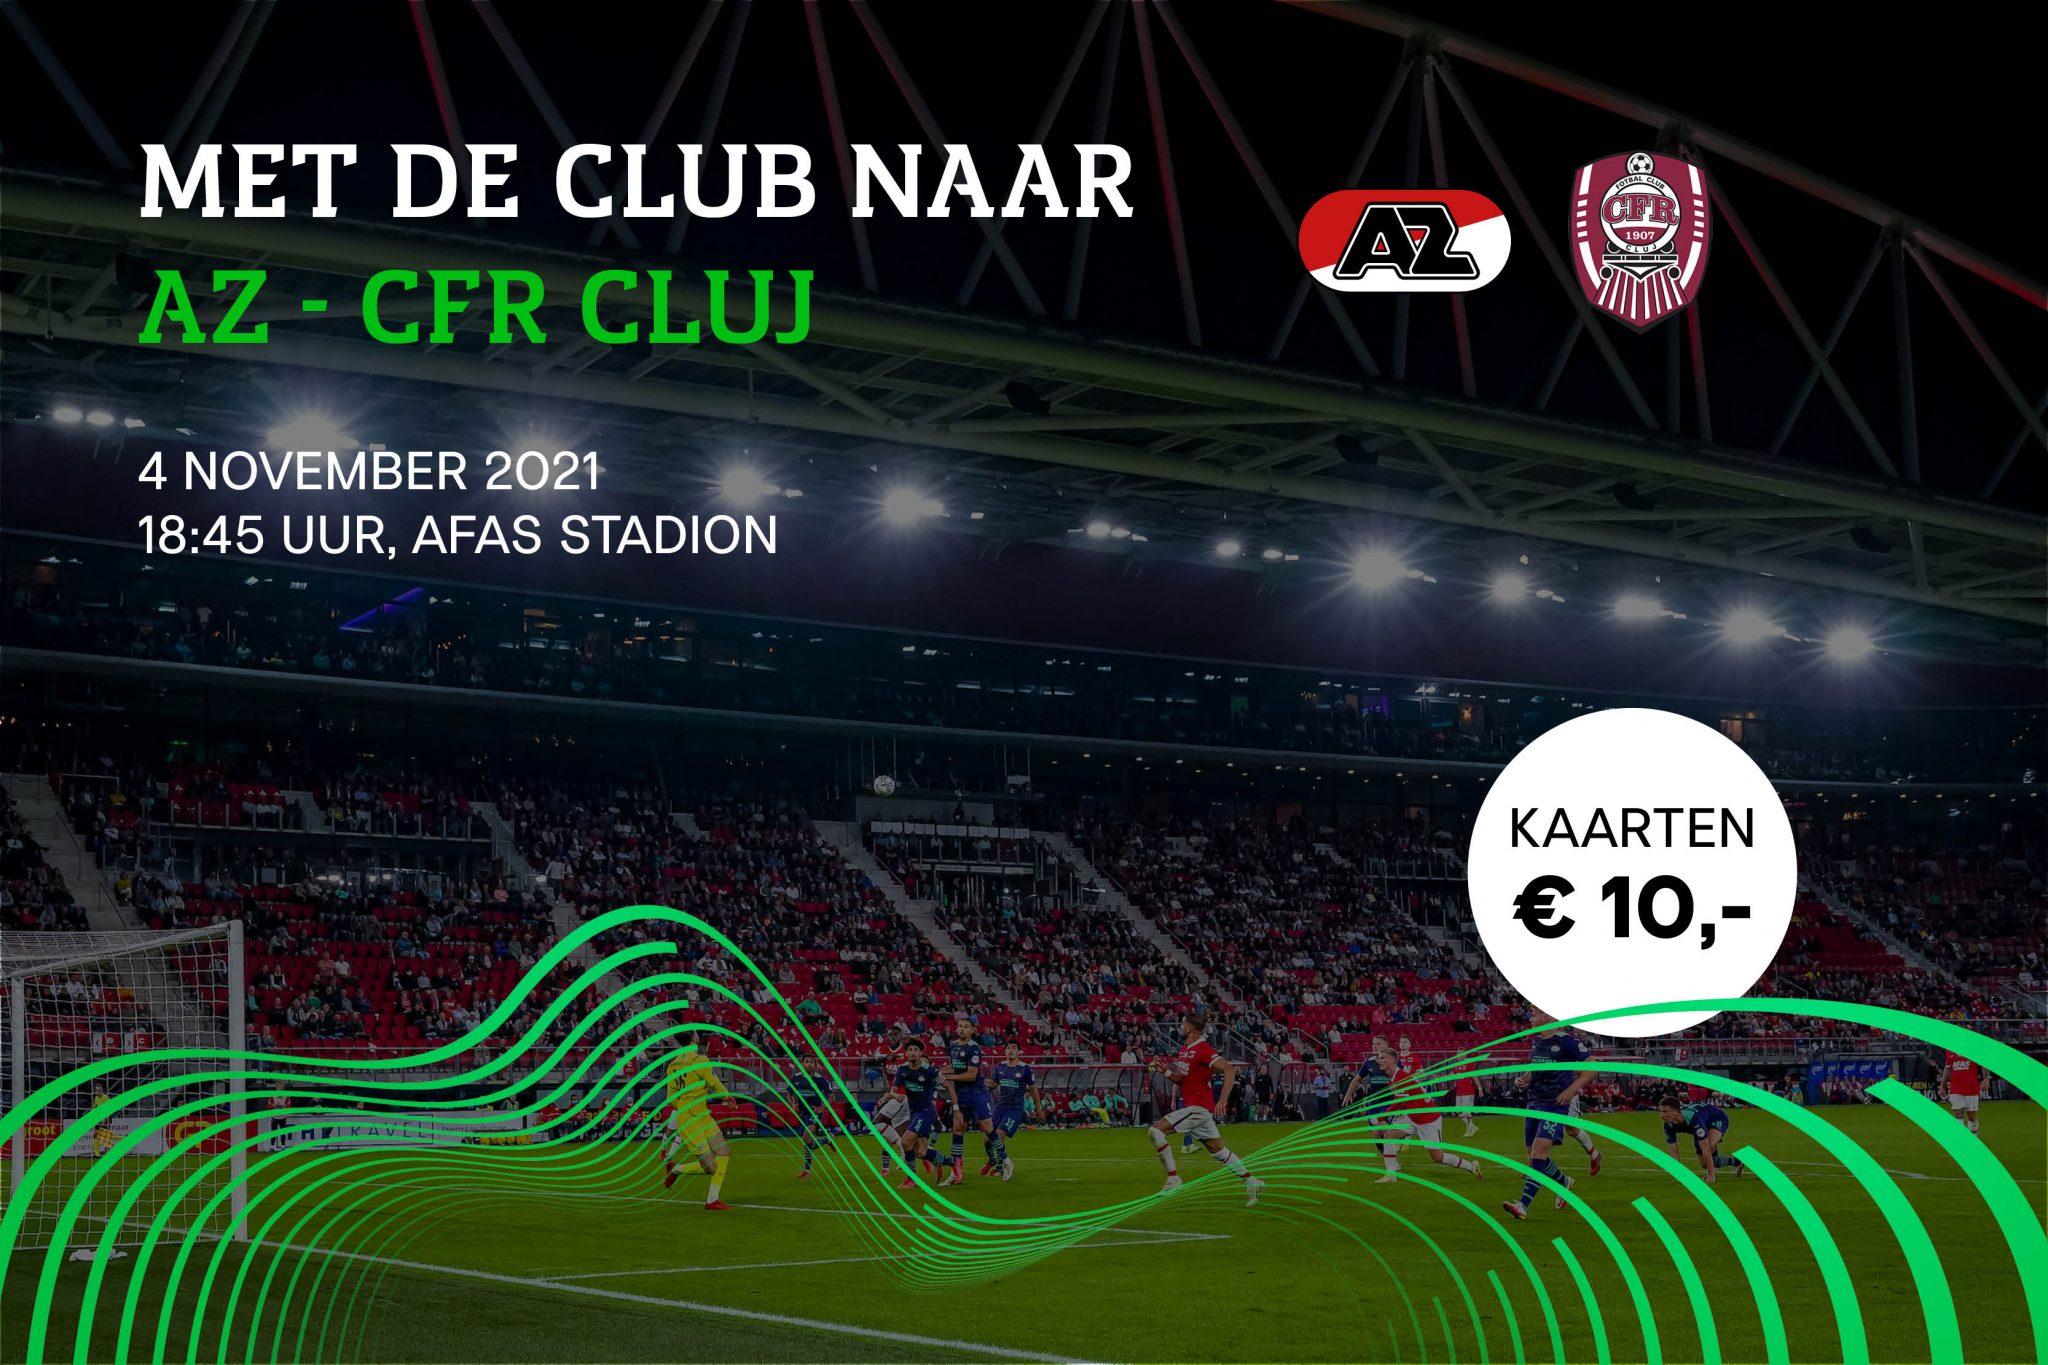 Ga mee naar AZ - CFR Cluj op 4 november